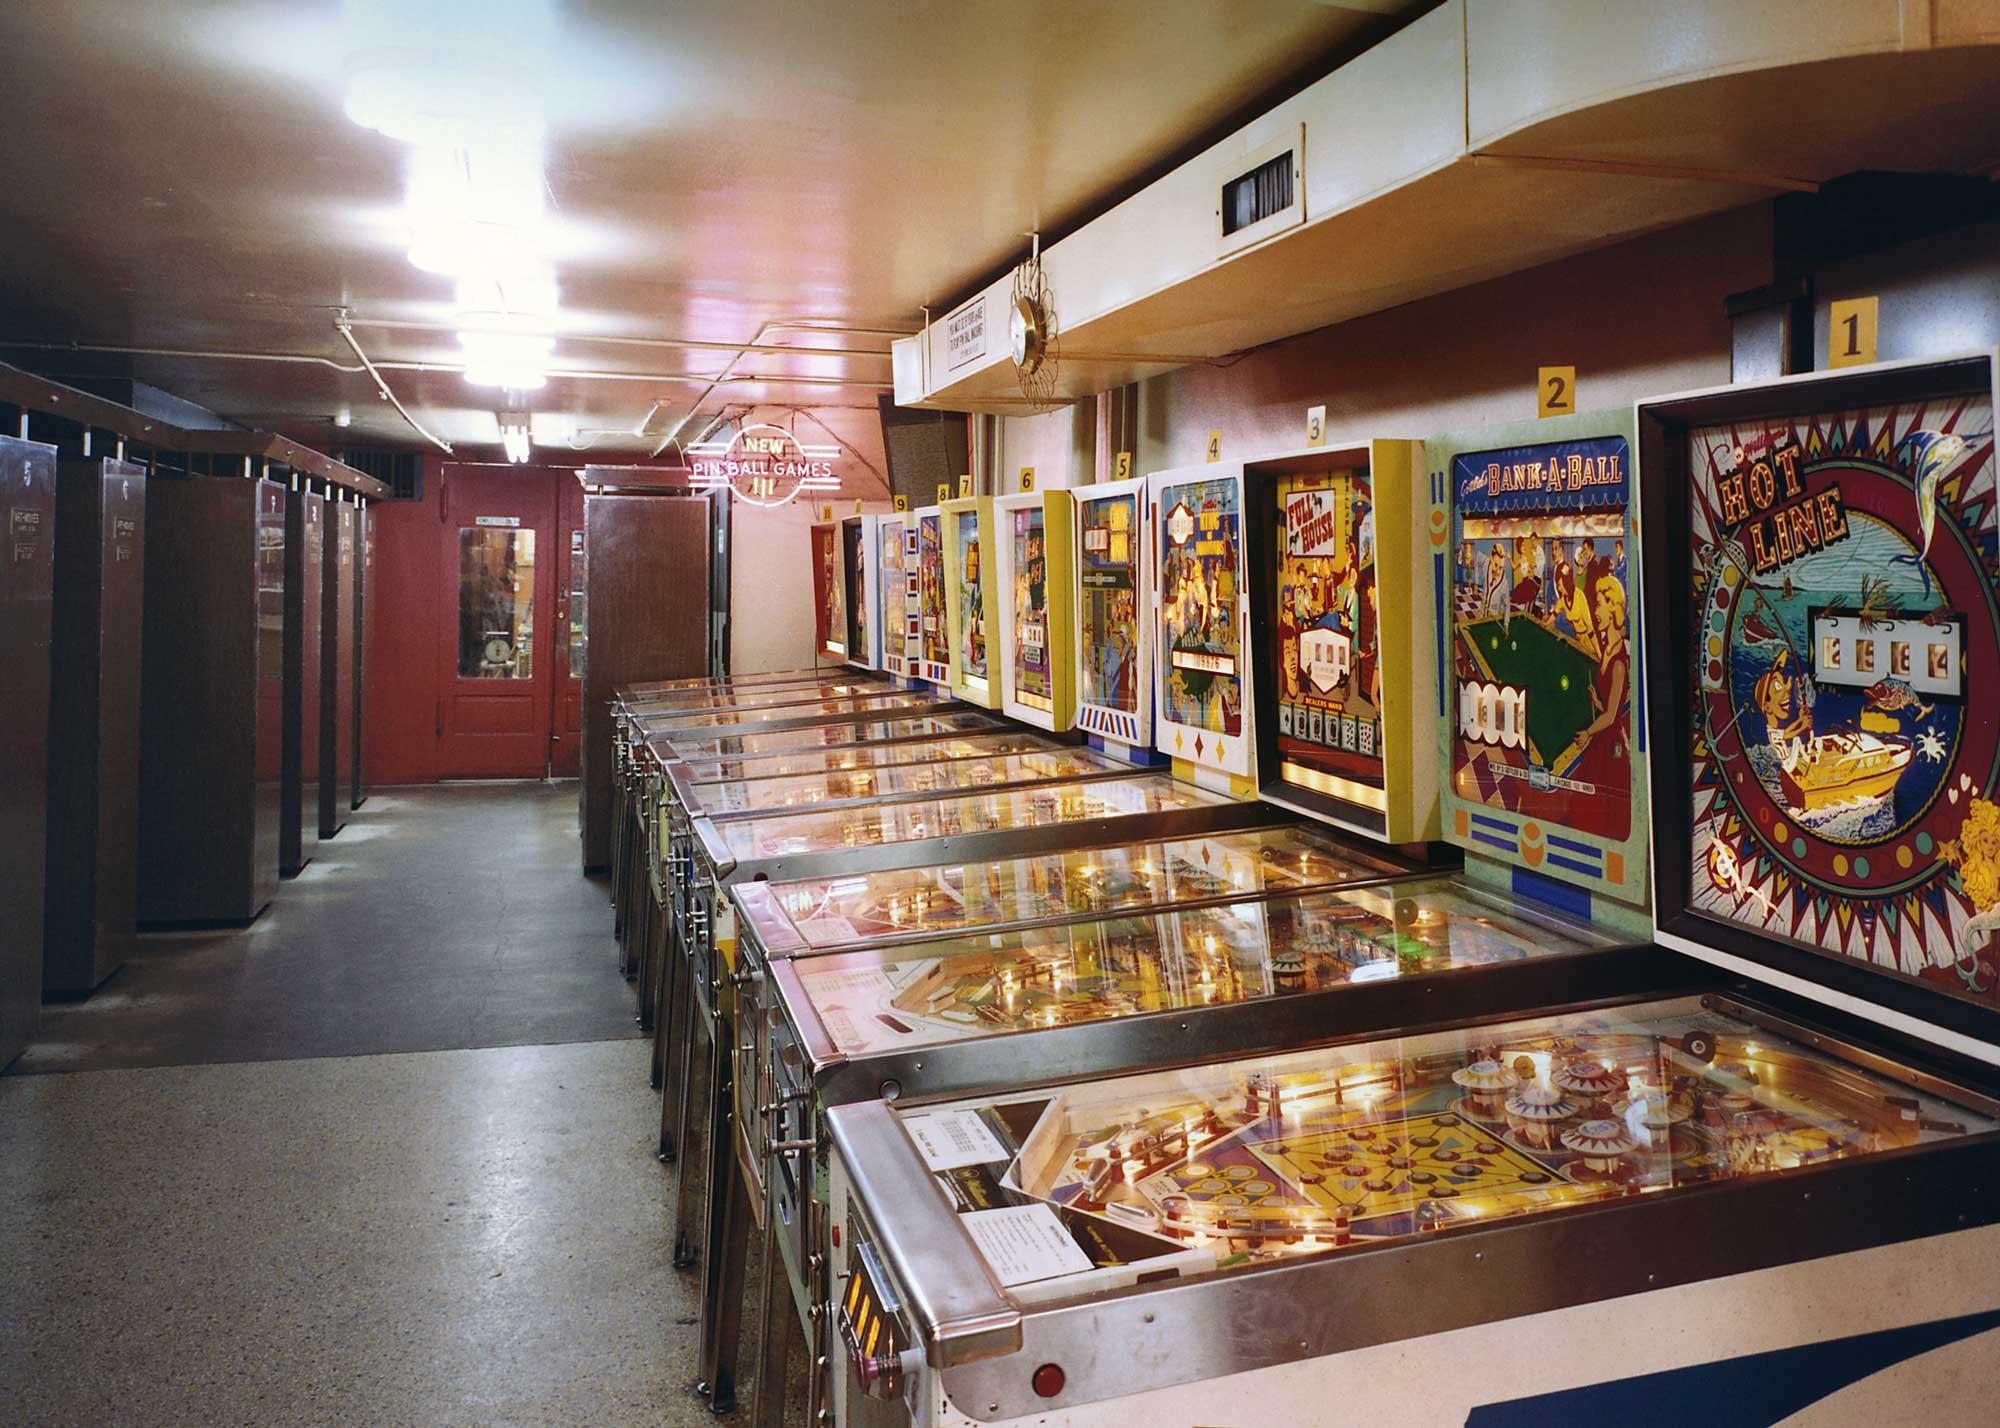 wonderland-arcade-6.jpg